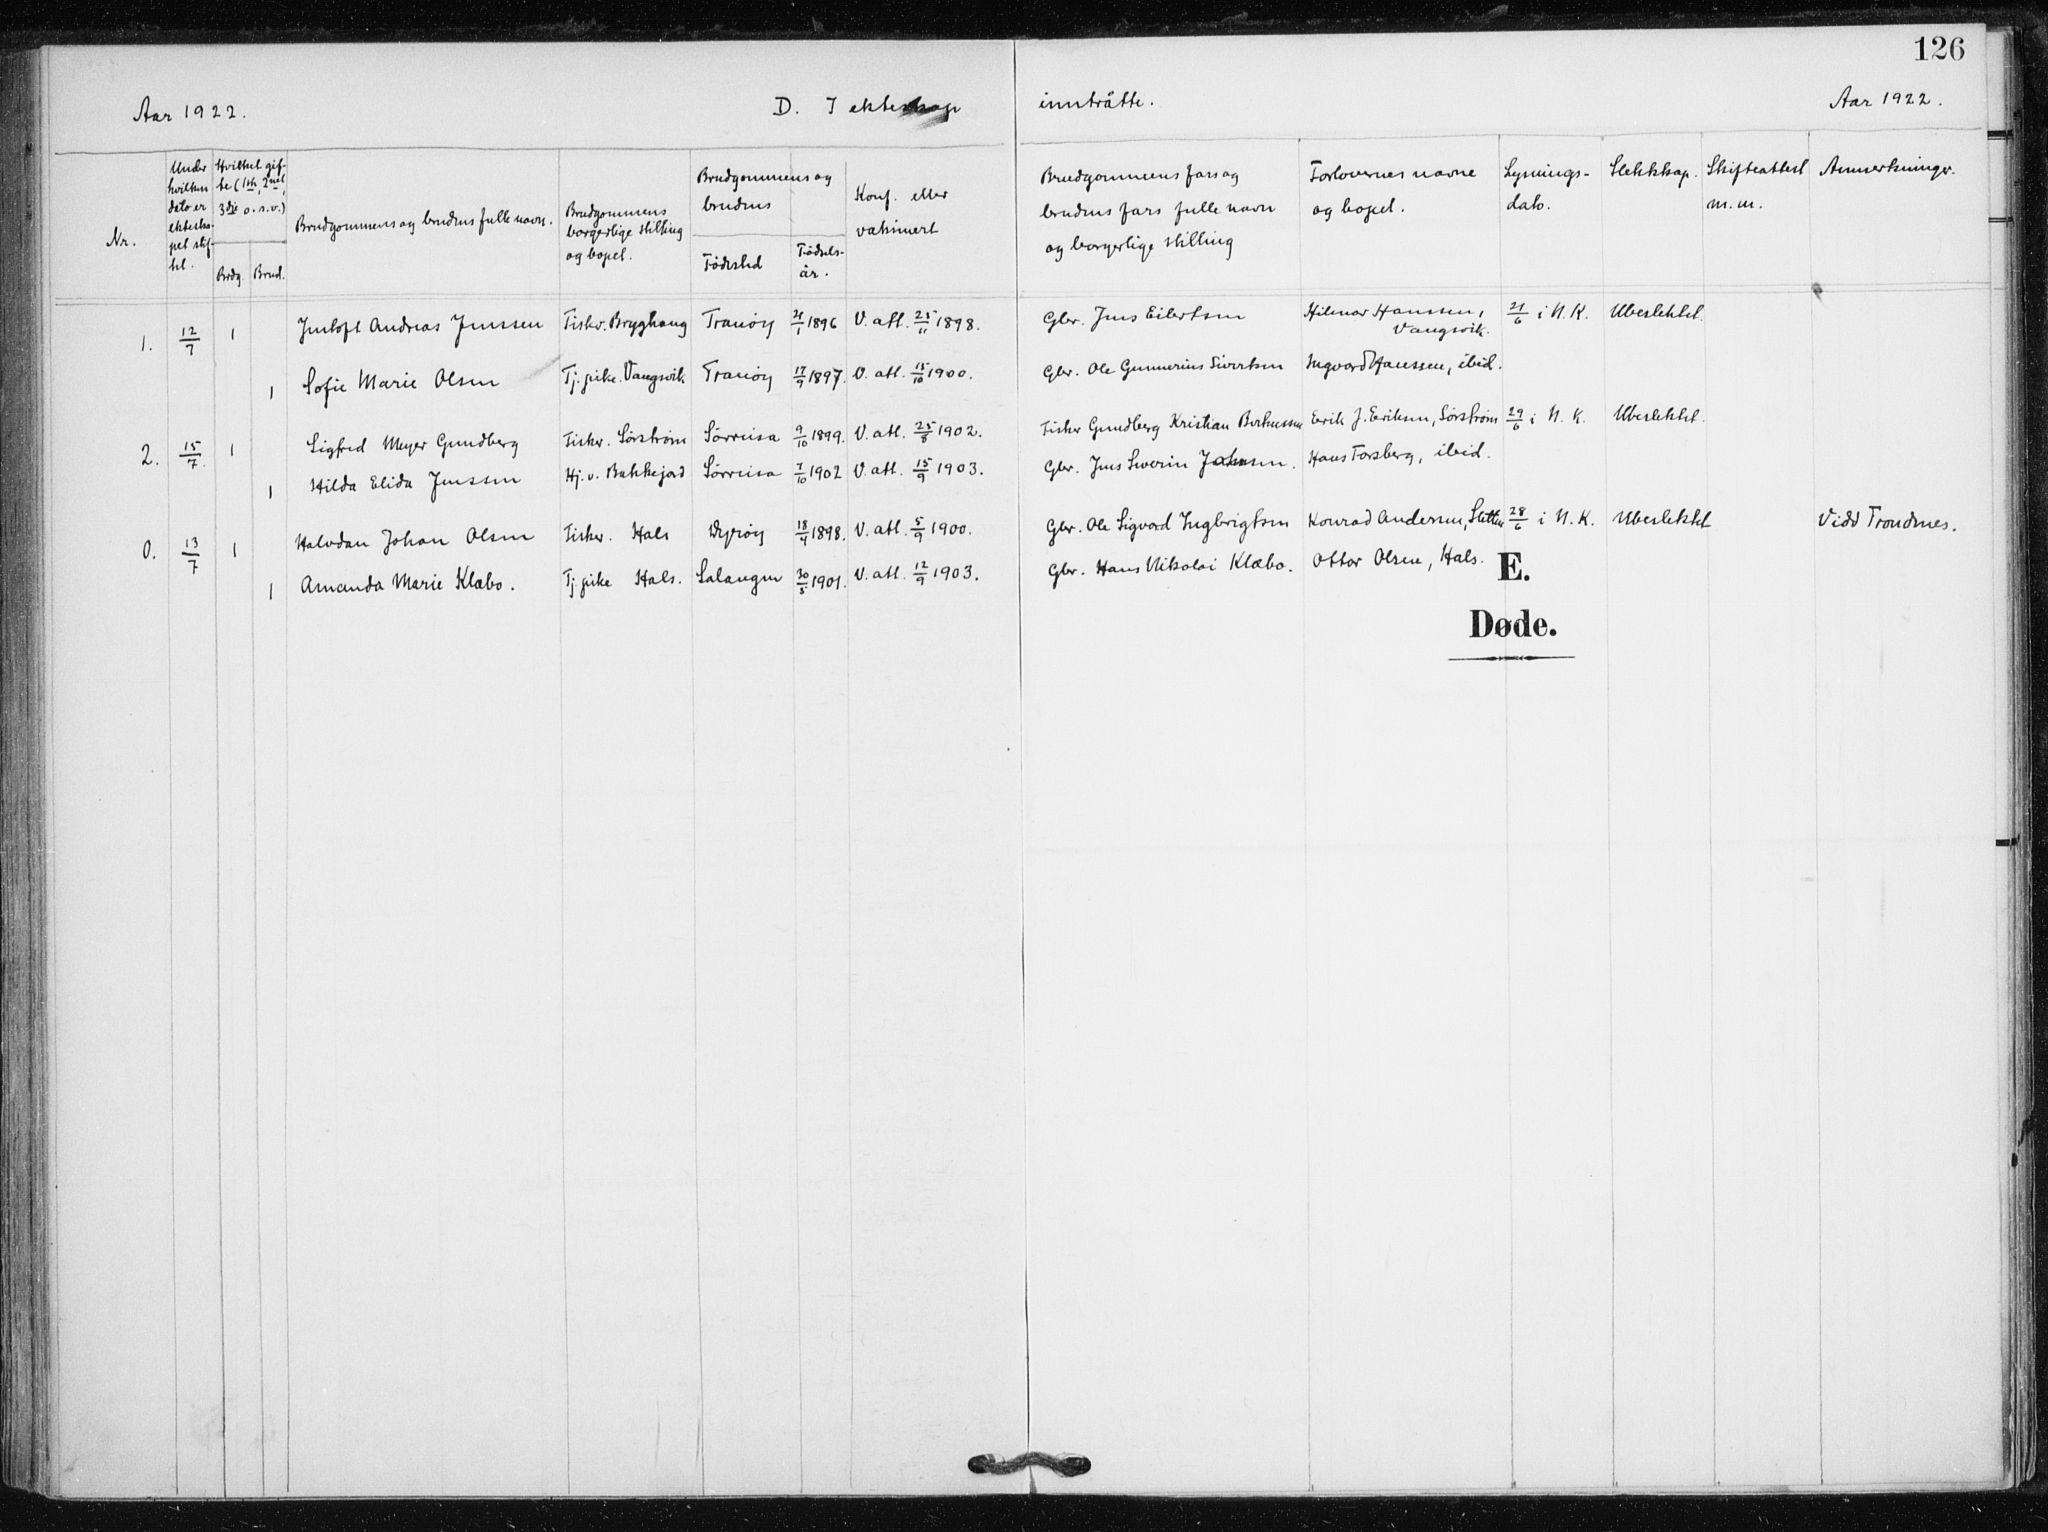 SATØ, Tranøy sokneprestkontor, I/Ia/Iaa/L0013kirke: Ministerialbok nr. 13, 1905-1922, s. 126